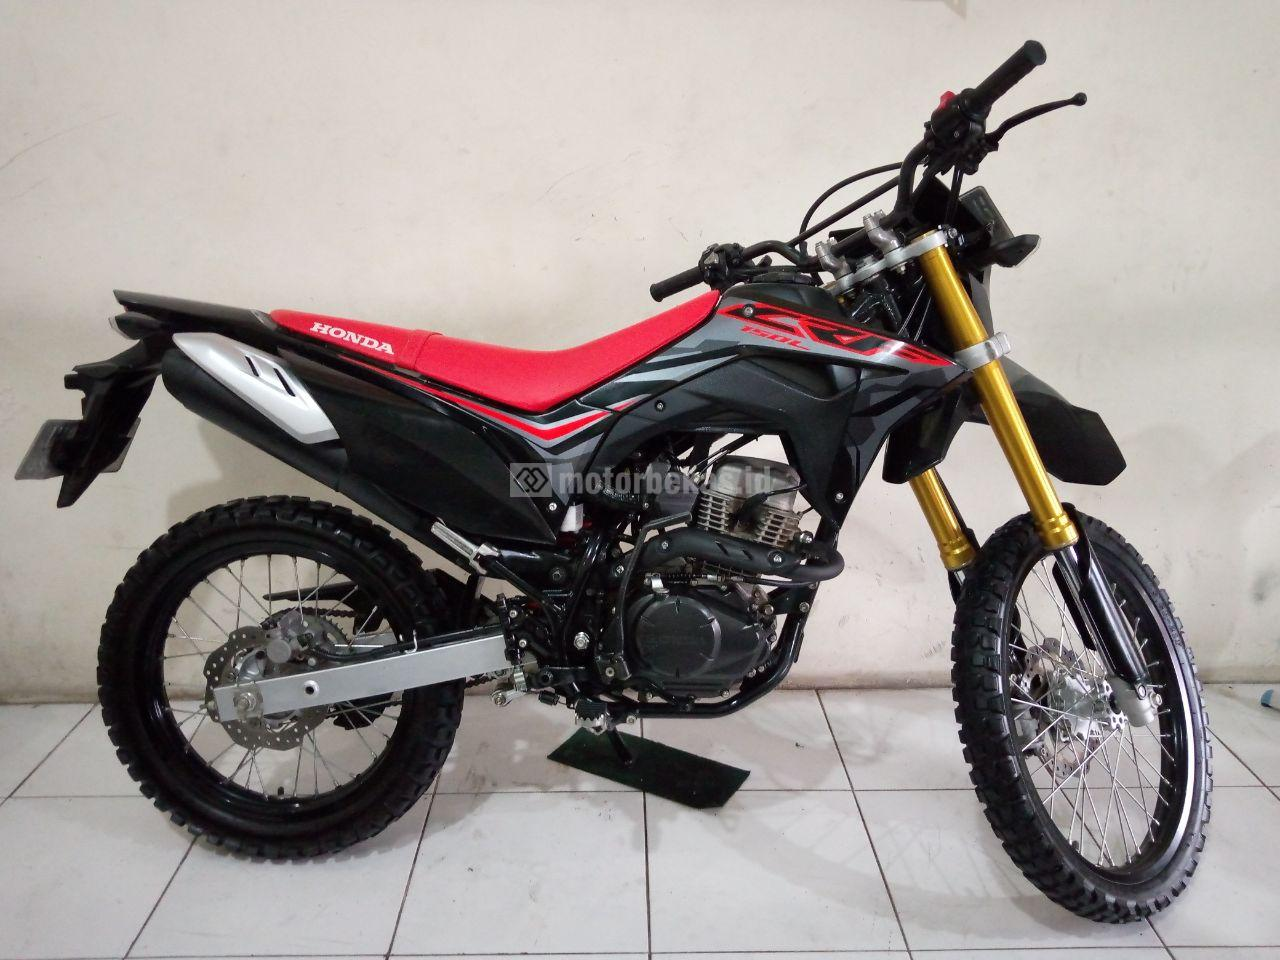 HONDA CRF 150L  1033 motorbekas.id